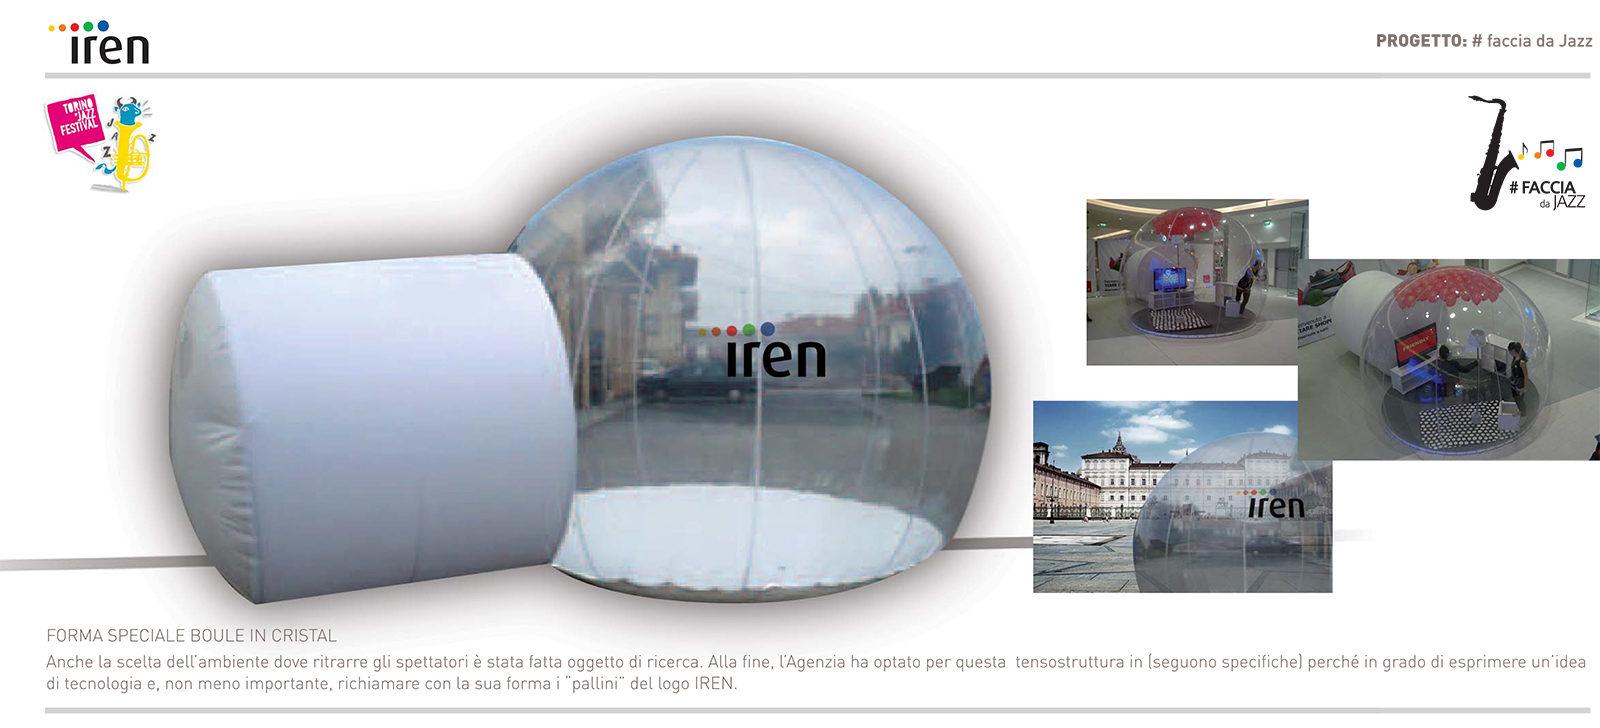 Iren – Gara per stand al TJF